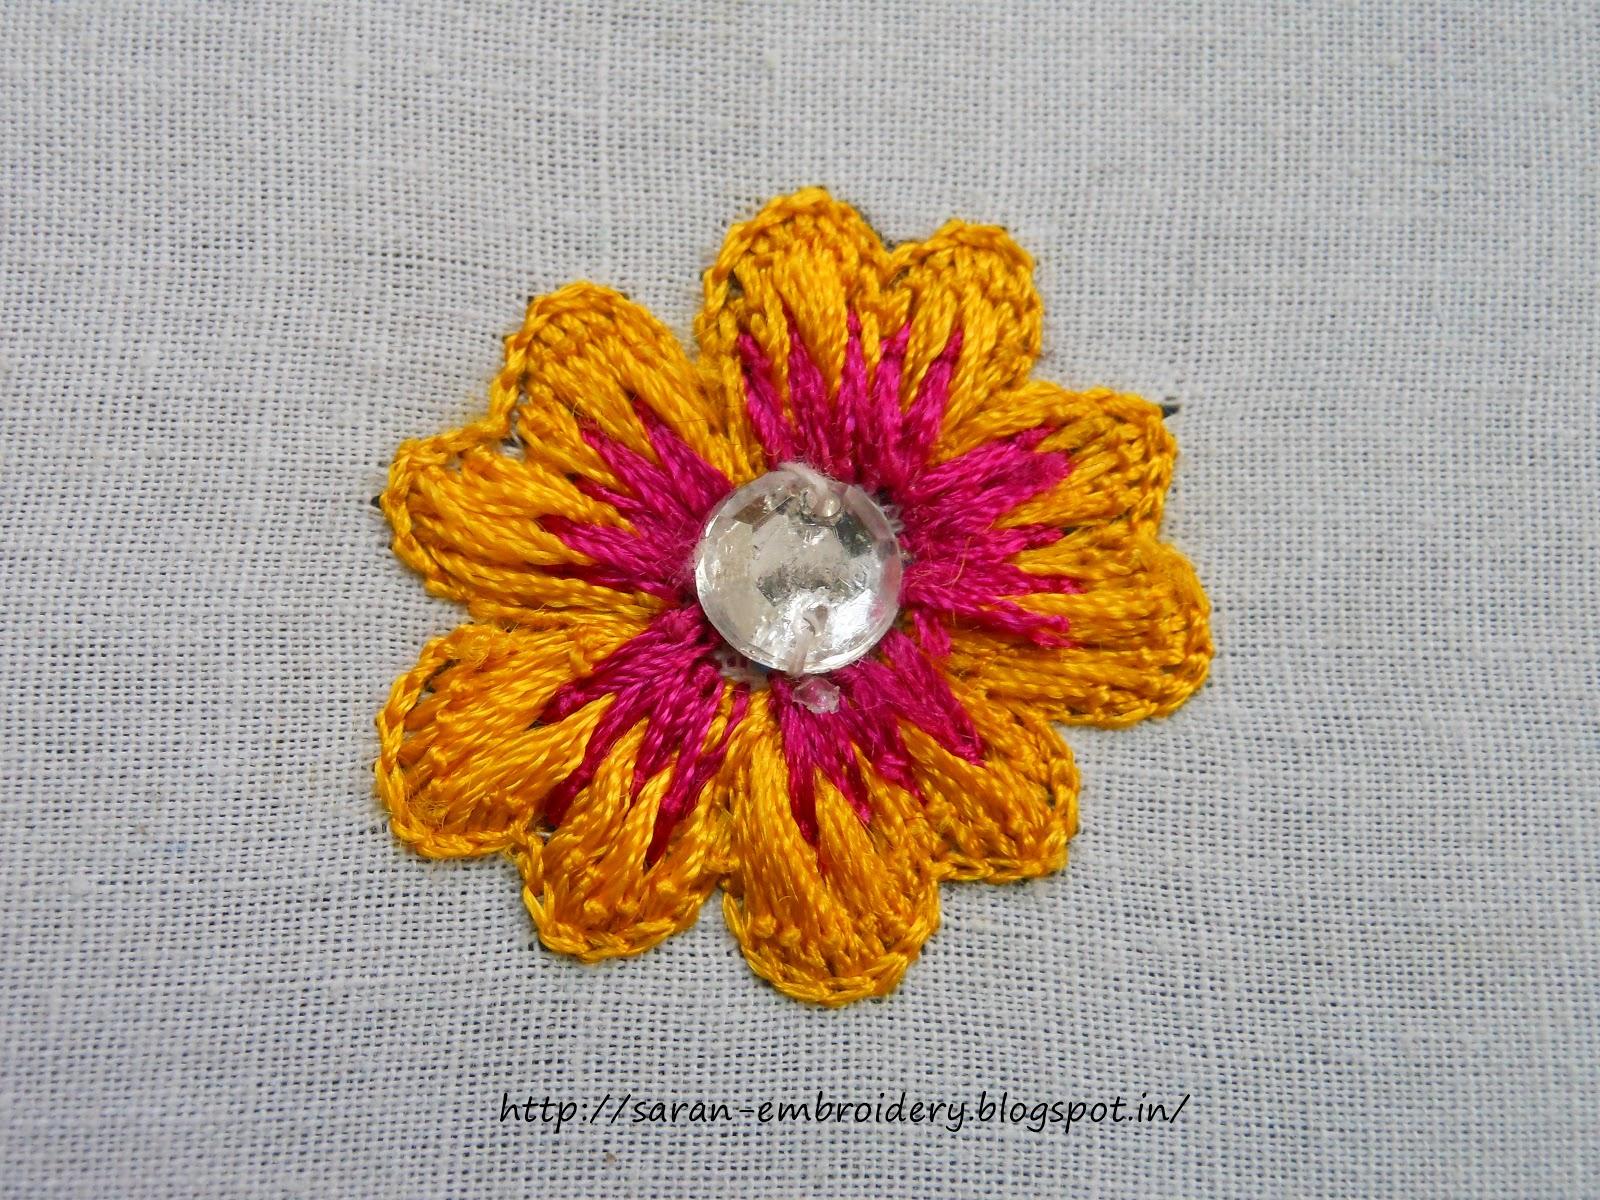 Saran embroidery aari flower design